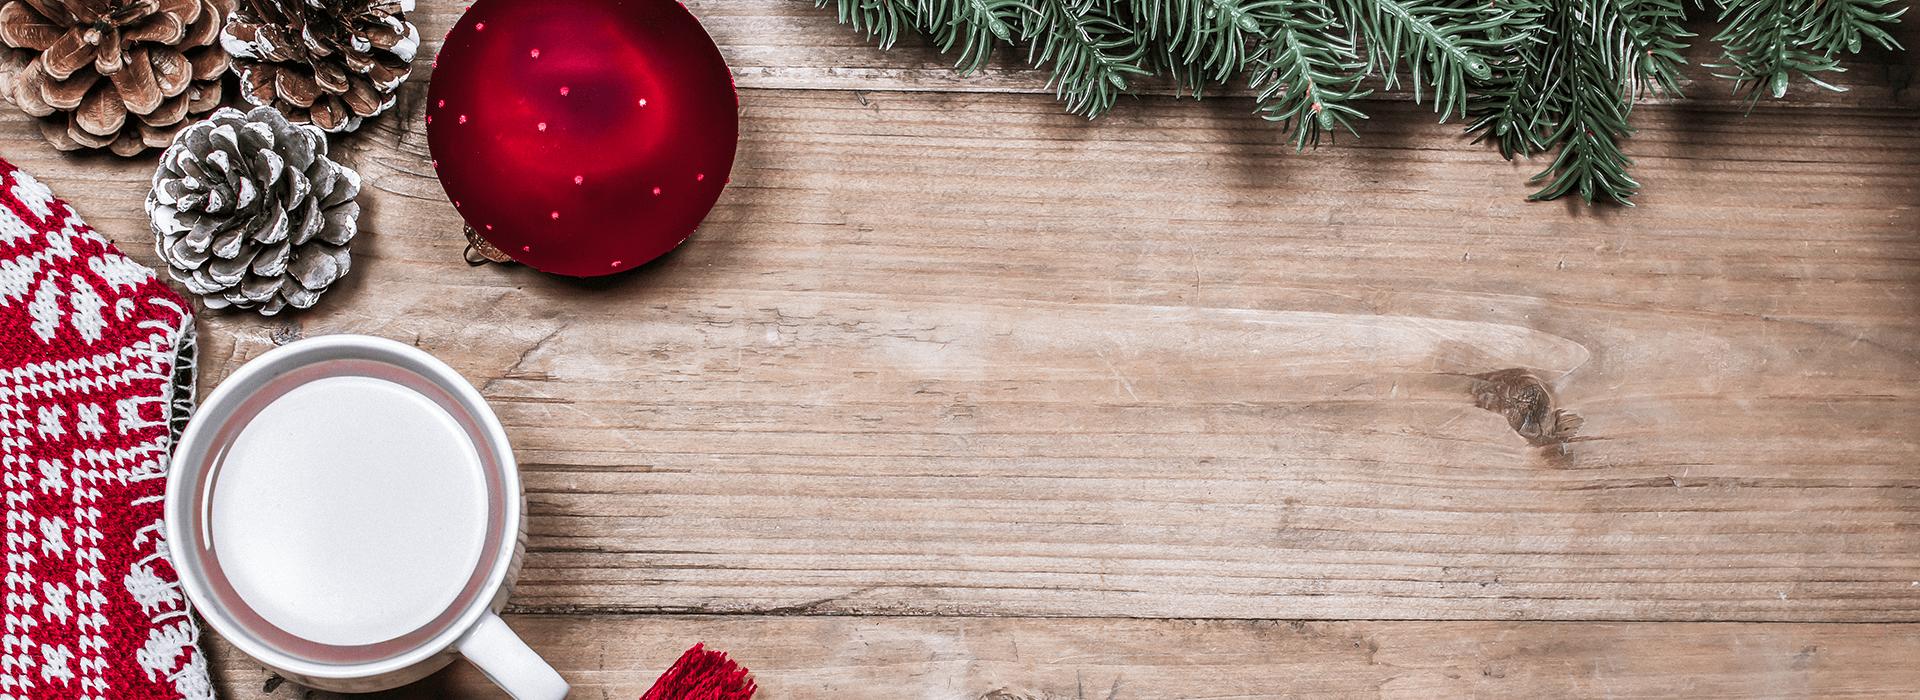 Specialty Christmas Baskets USA